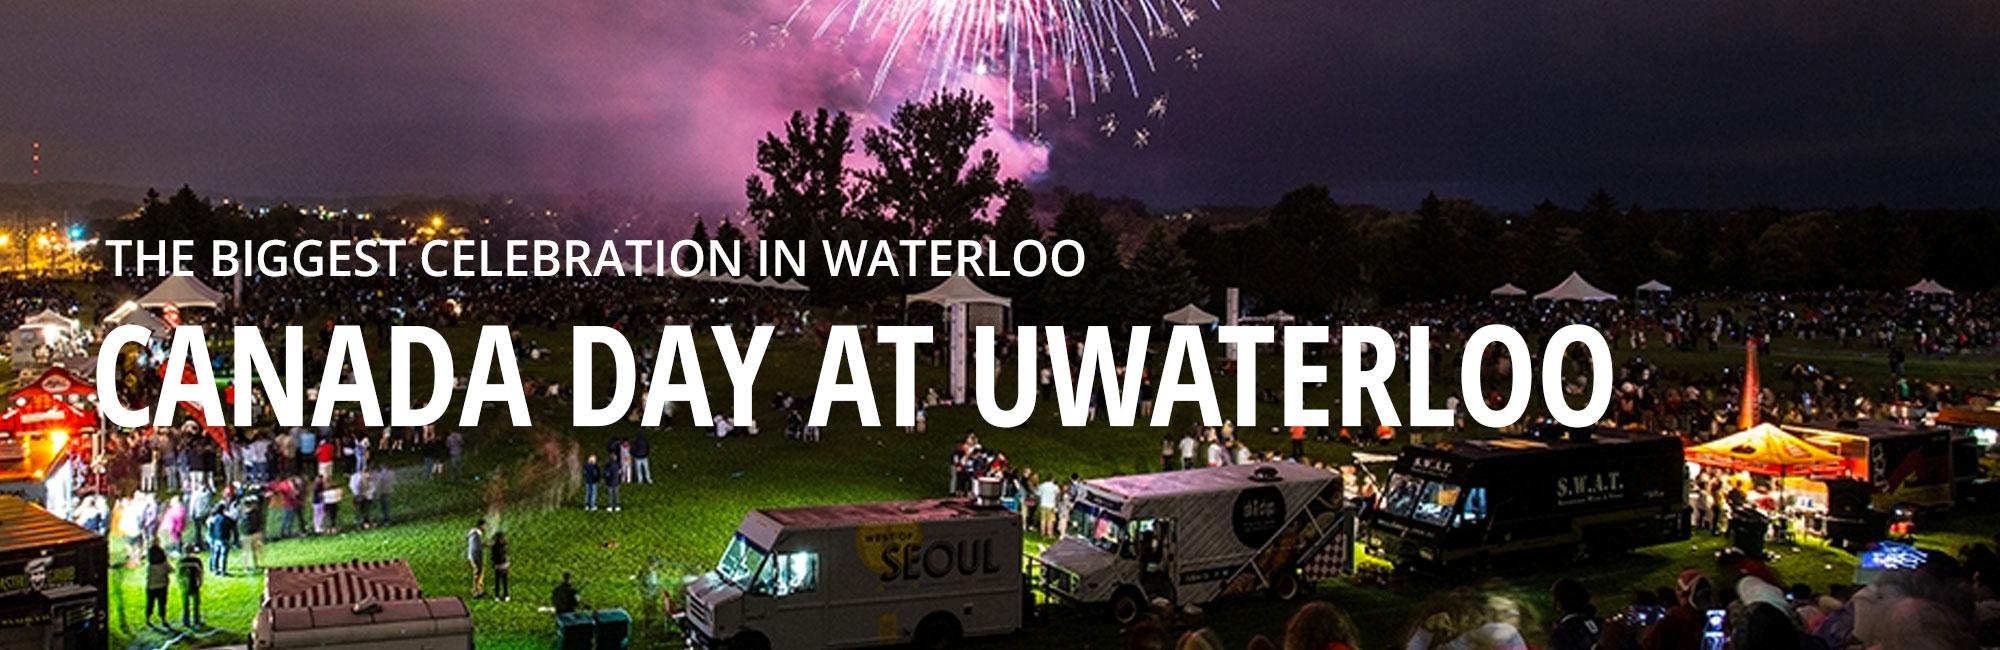 Canada Day celebration at UWaterloo.